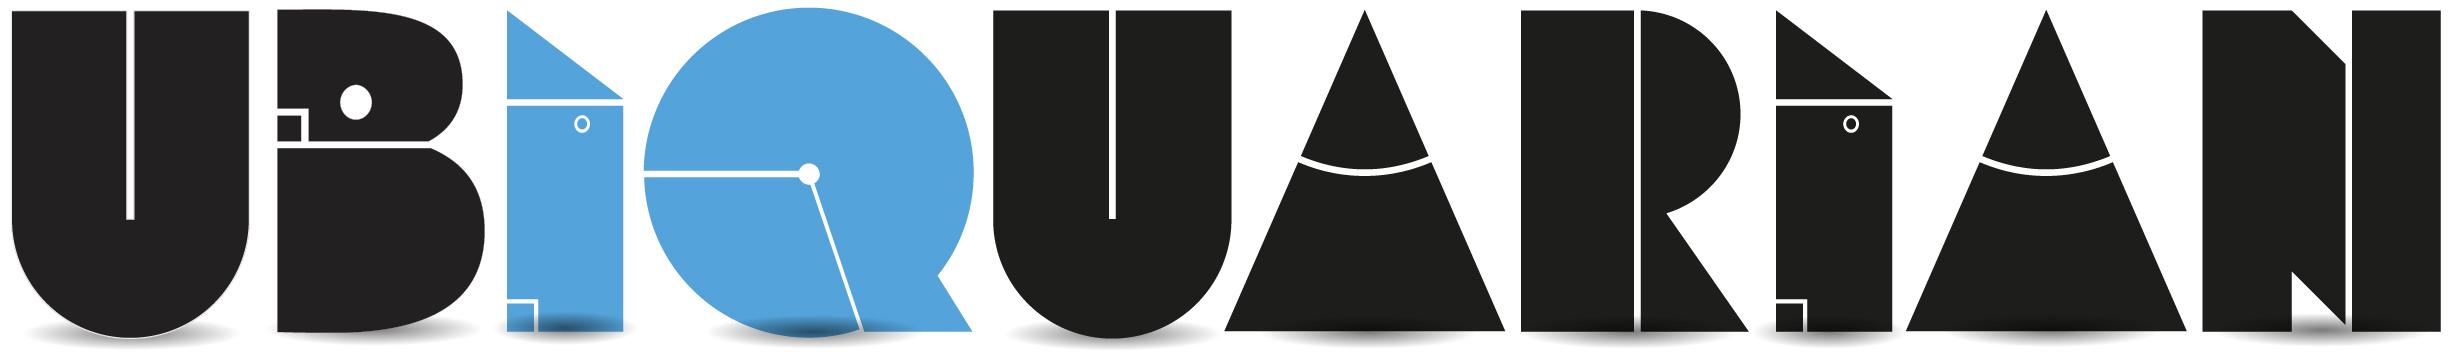 ubiquarian banner